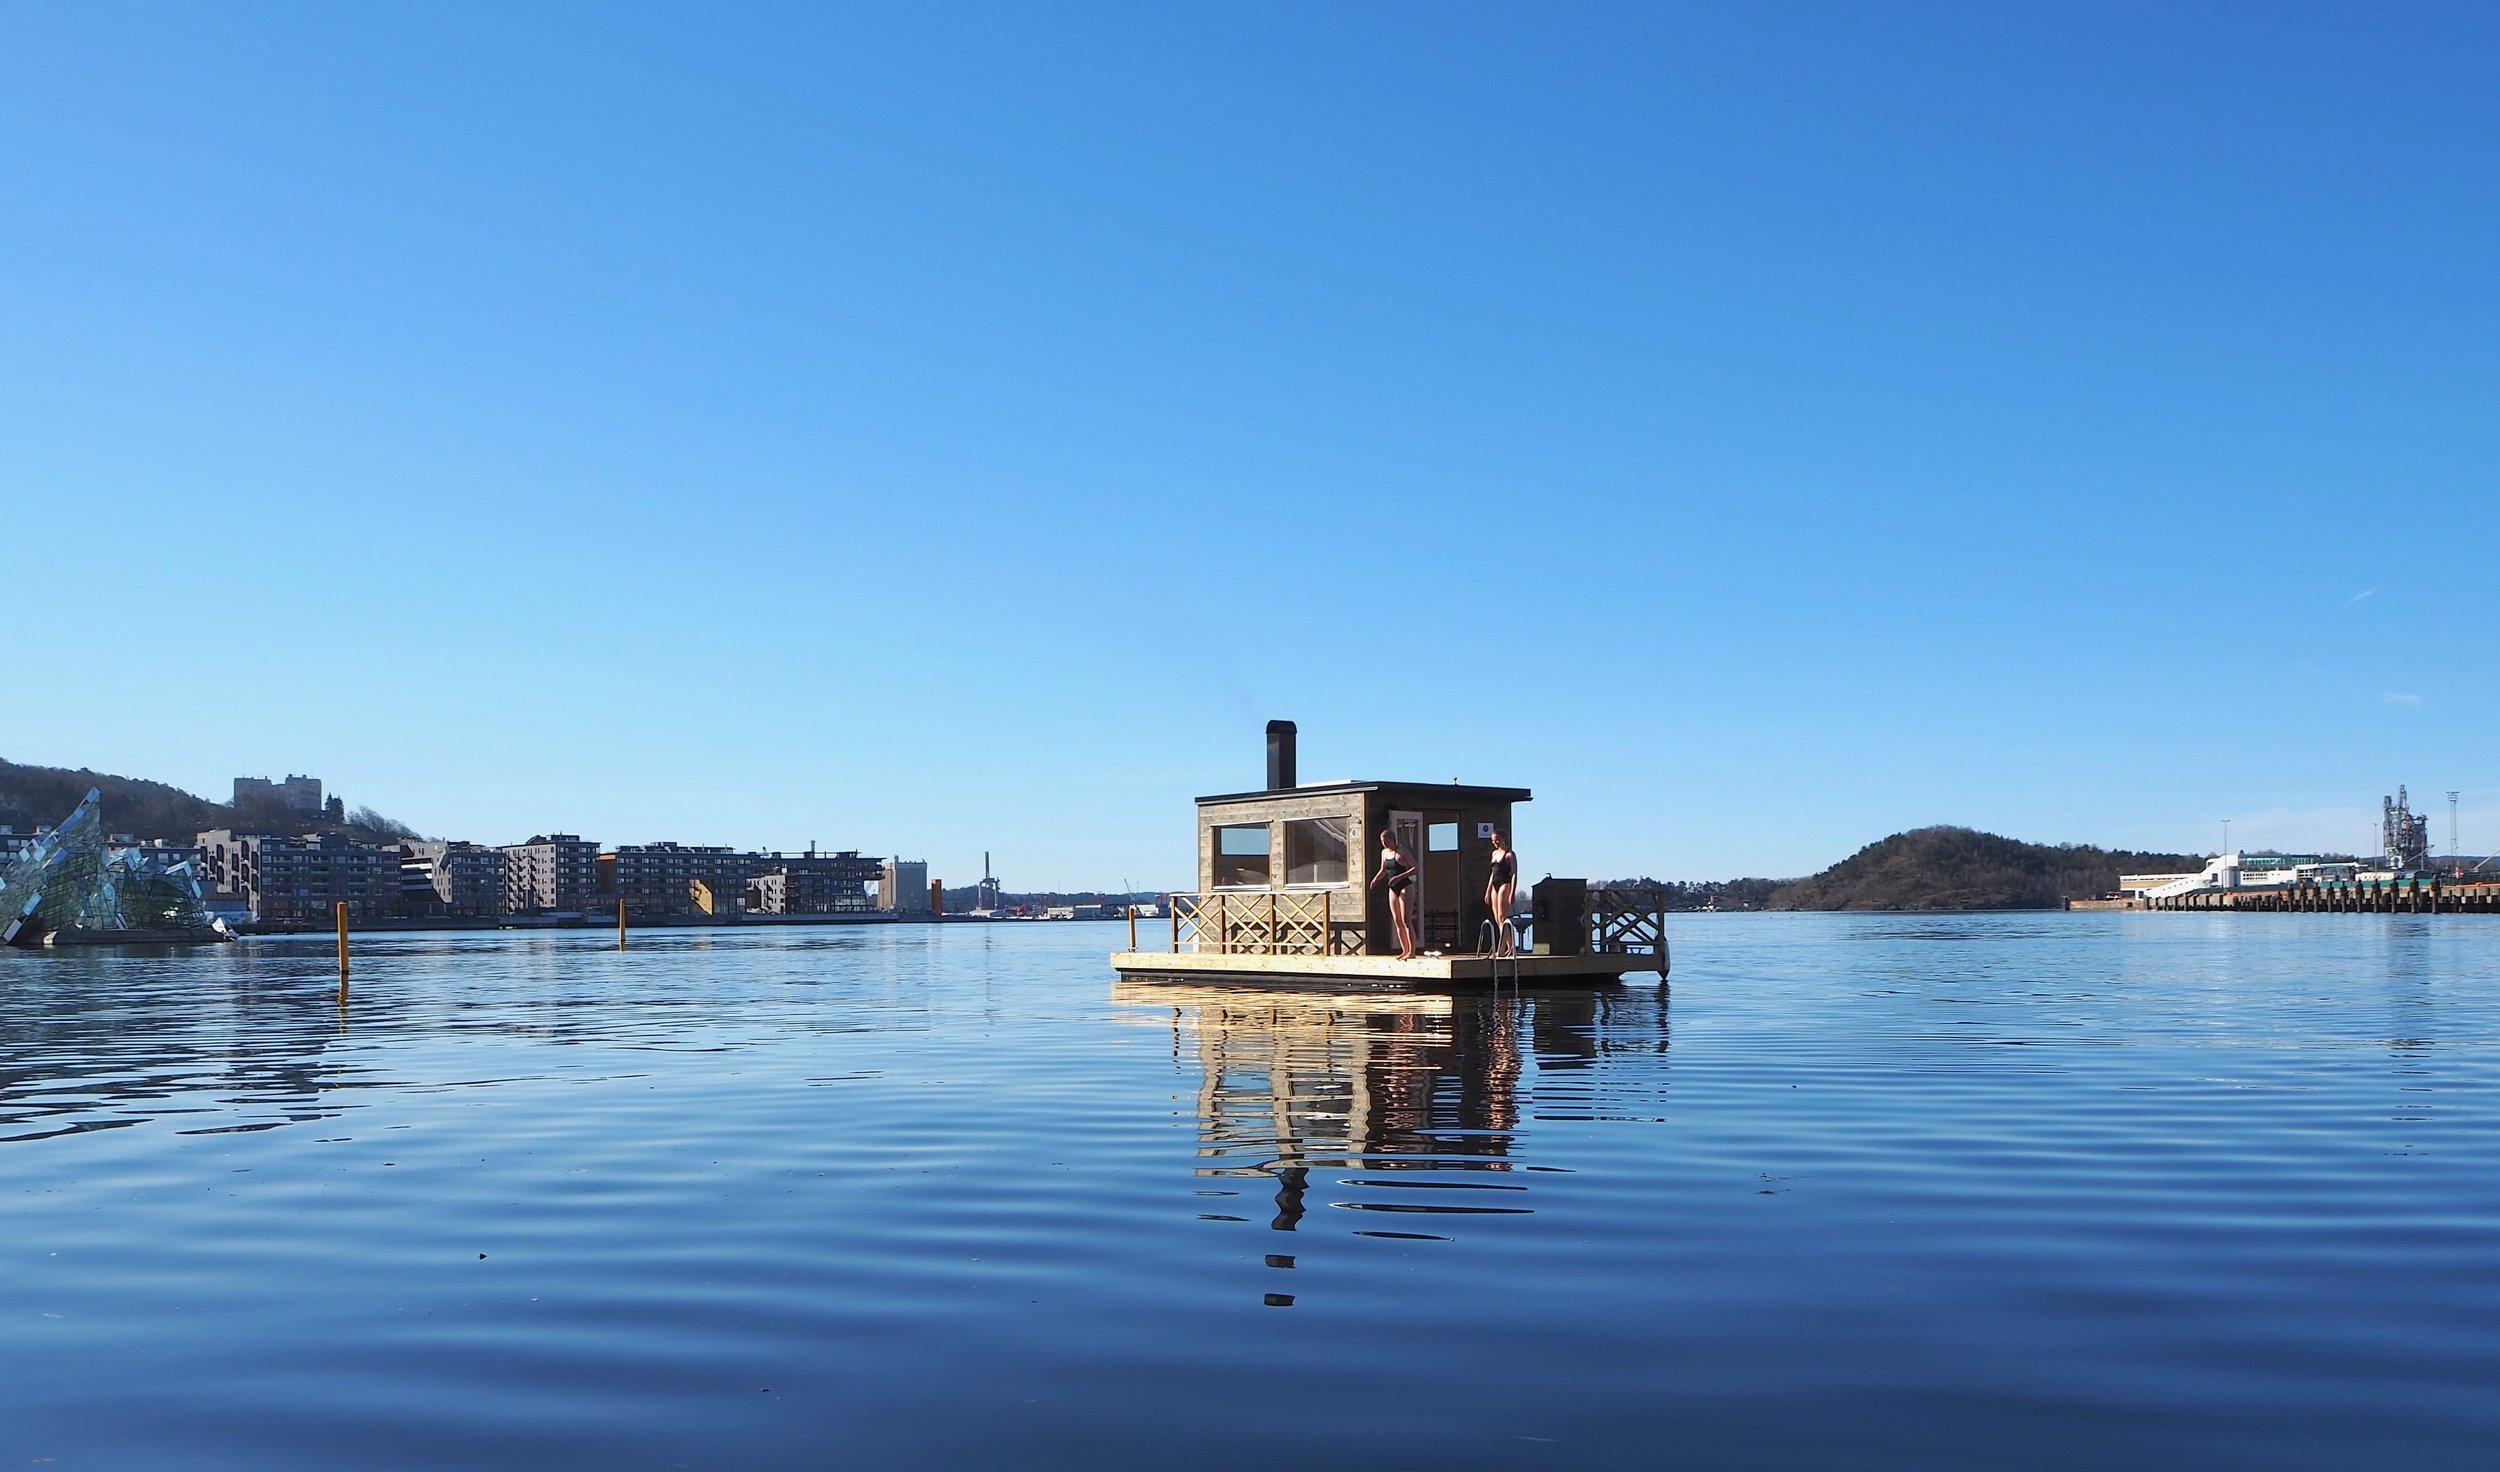 KOK – the floating sauna